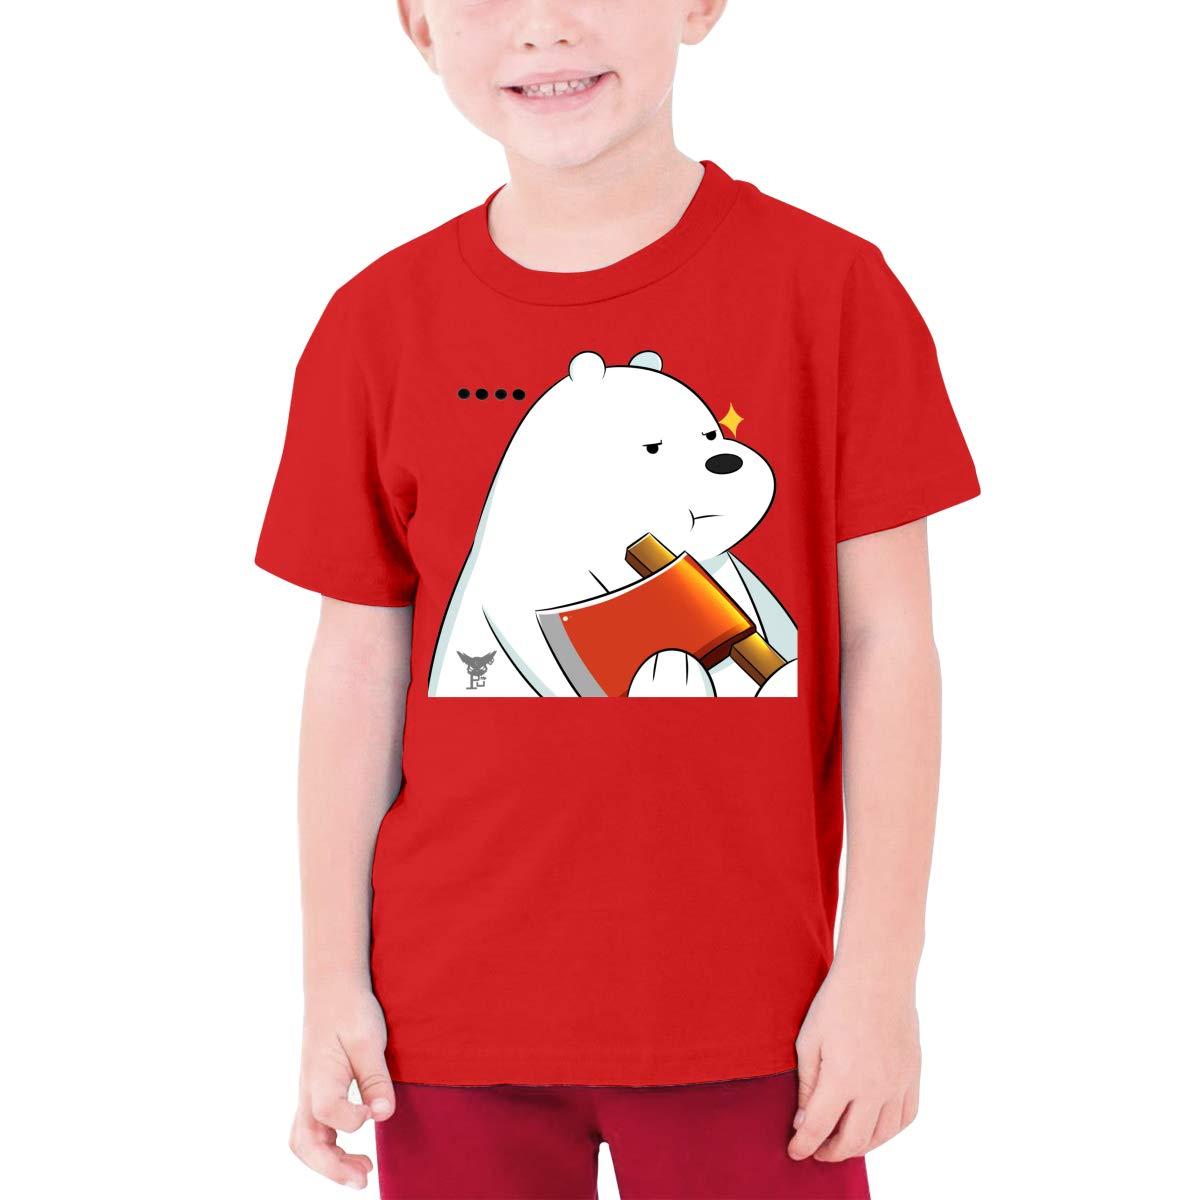 Juwuwenhuachua Customized We Bare Bears Funny T Shirt Short Sleeve for Minor Black